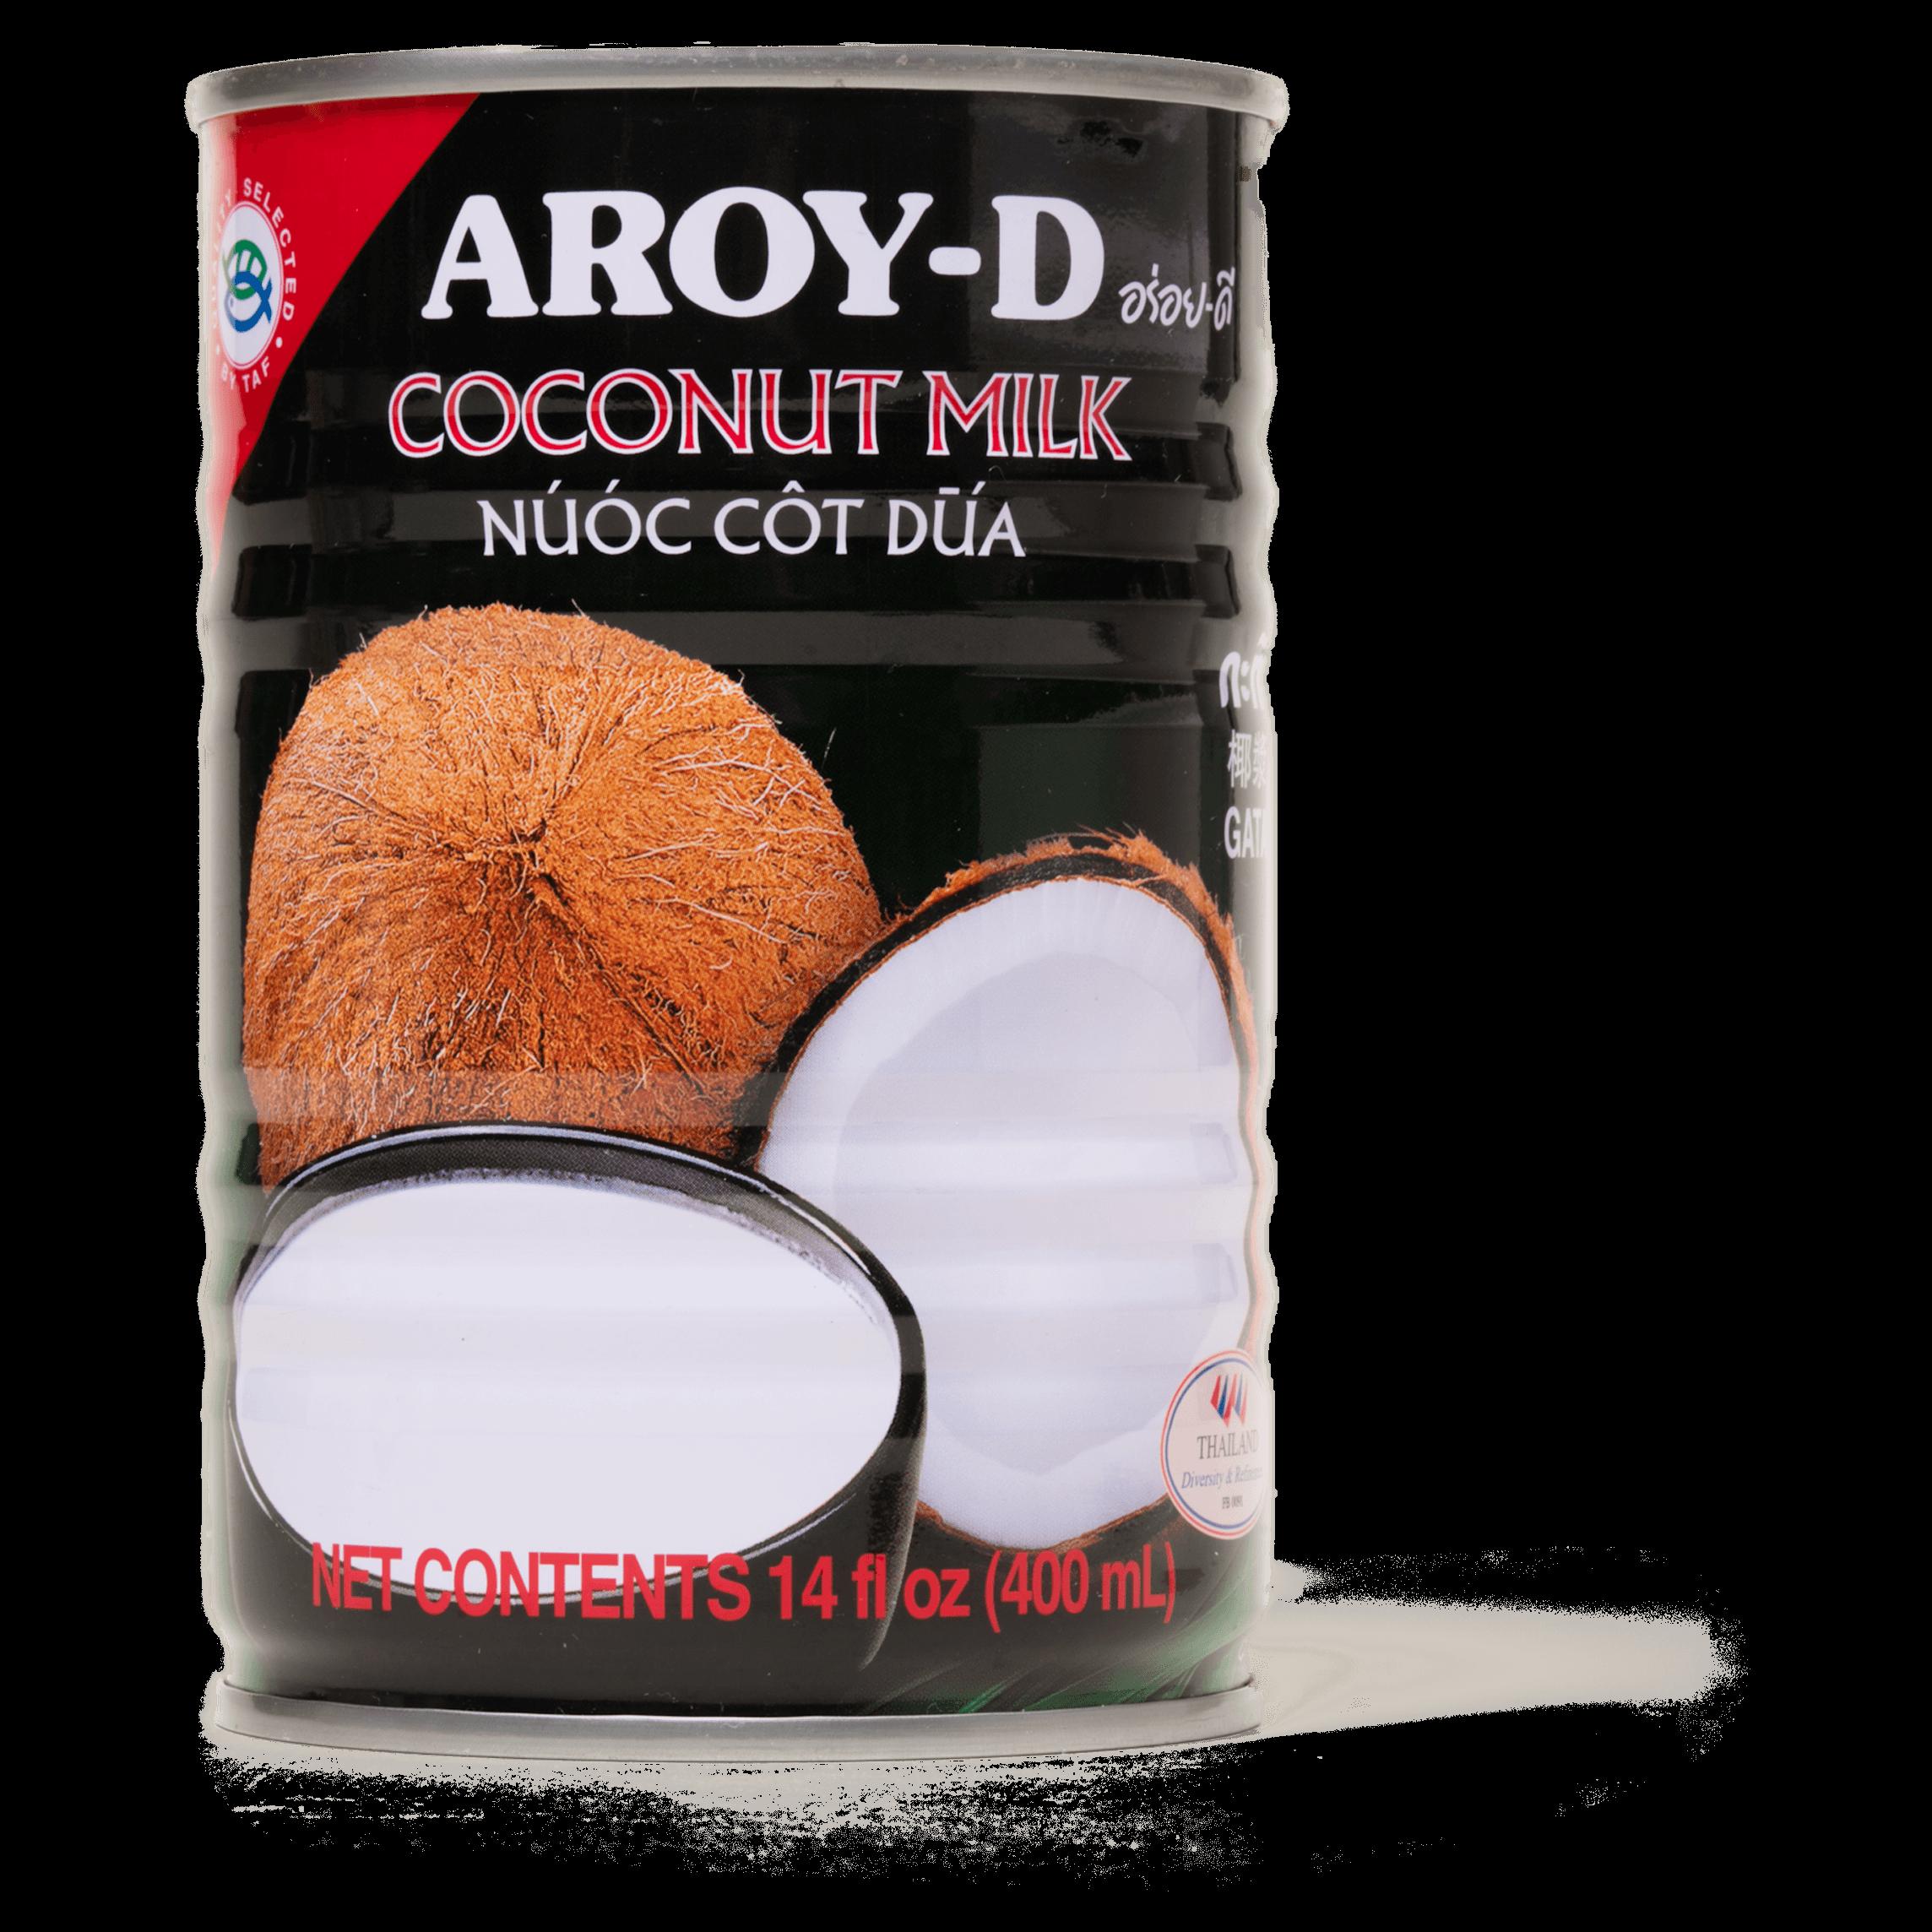 Thai Kitchen Coconut Milk Coconut Milk  Cook's Illustrated